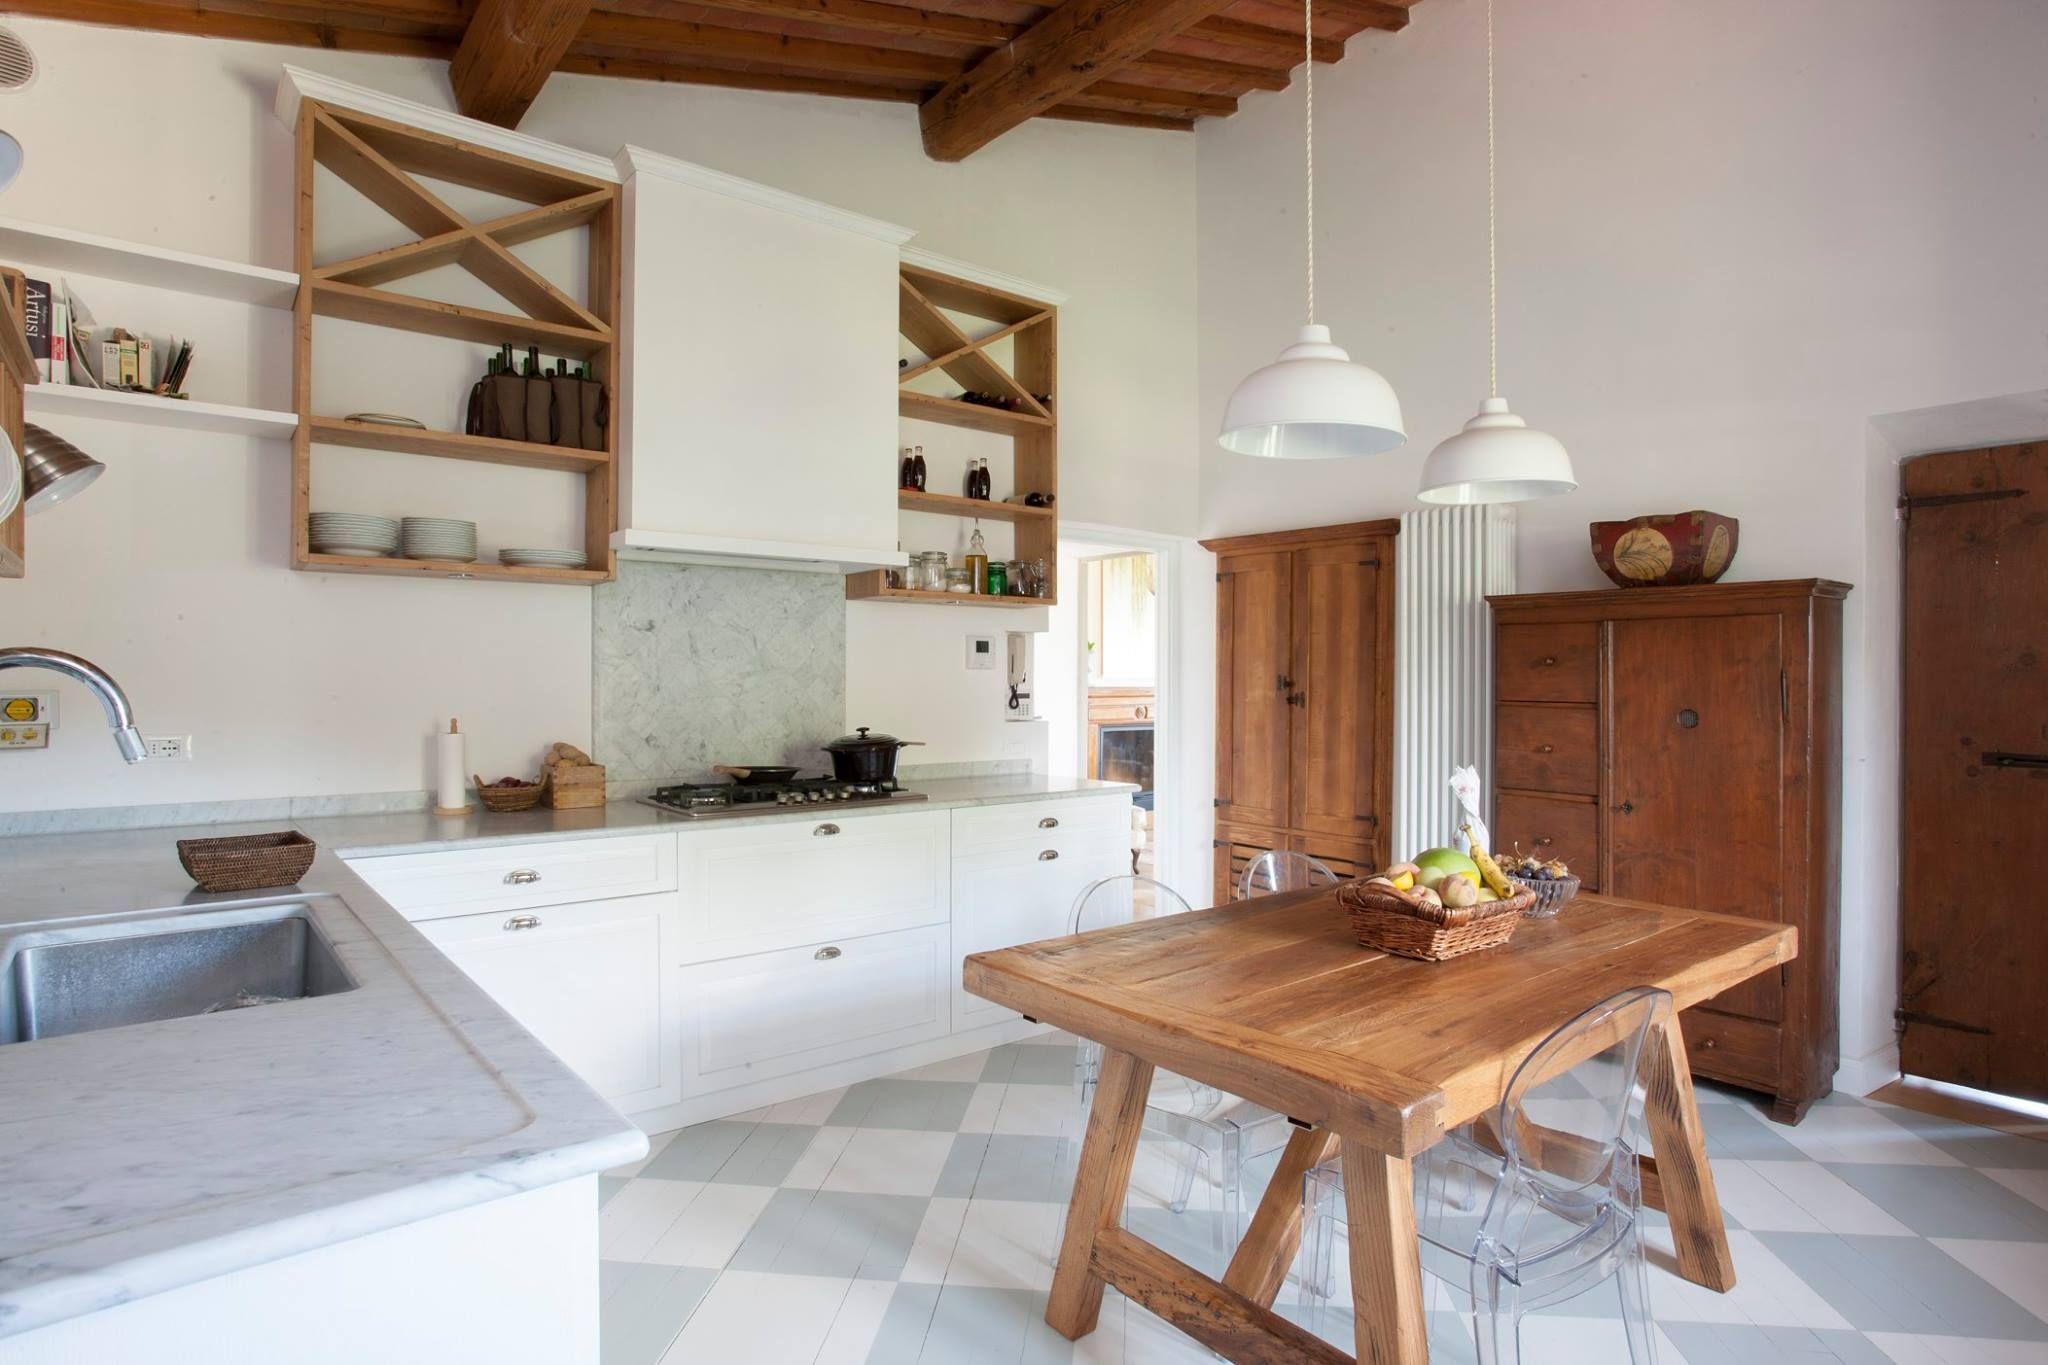 Cucina in rovere http://blog.pianetadonna.it/arredamentiroma ...